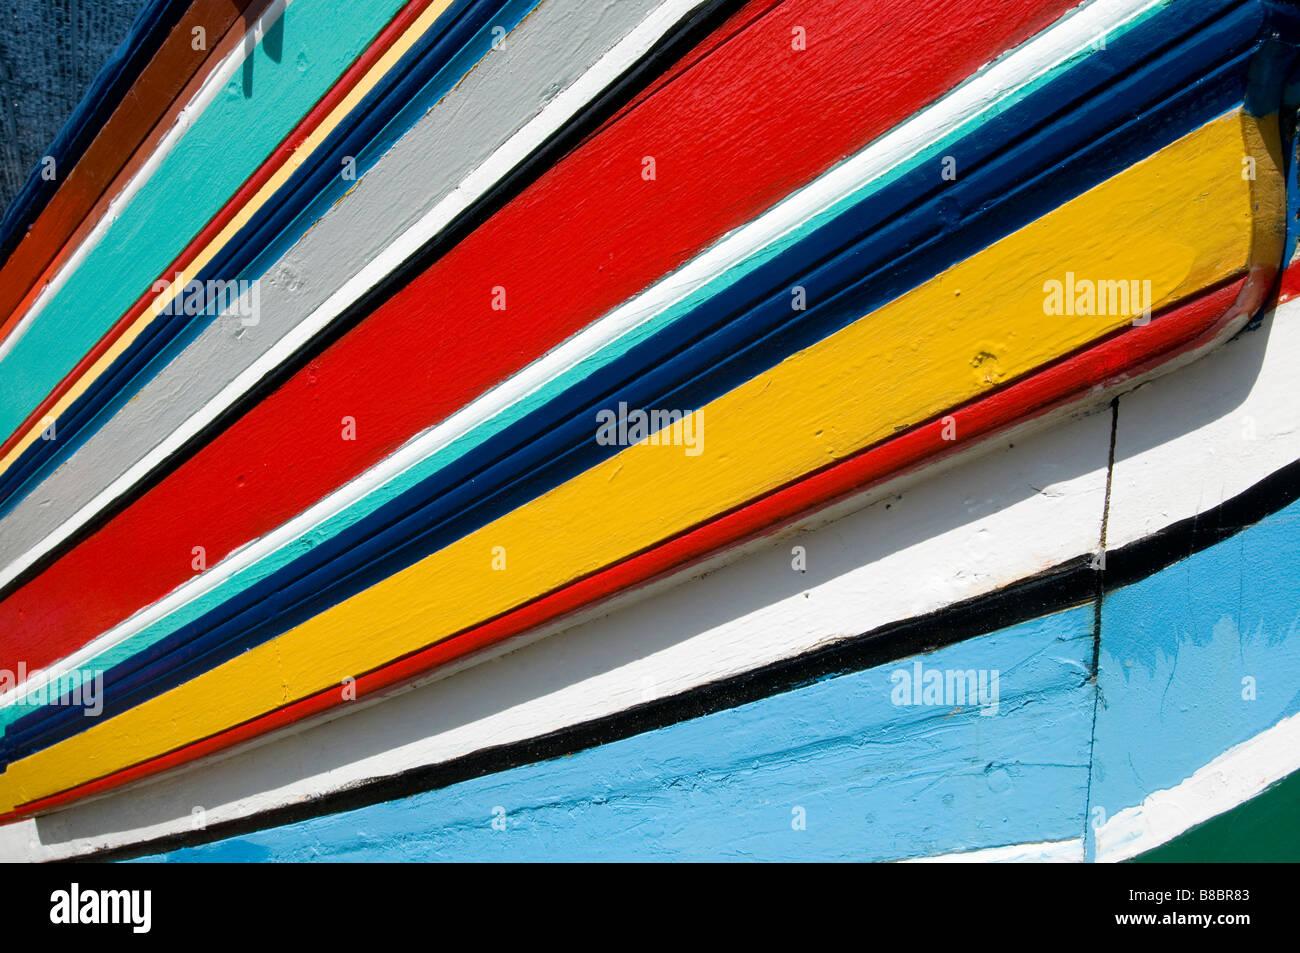 Malaysia Dock Fishing Boats Sailing Stock Photos & Malaysia Dock ...